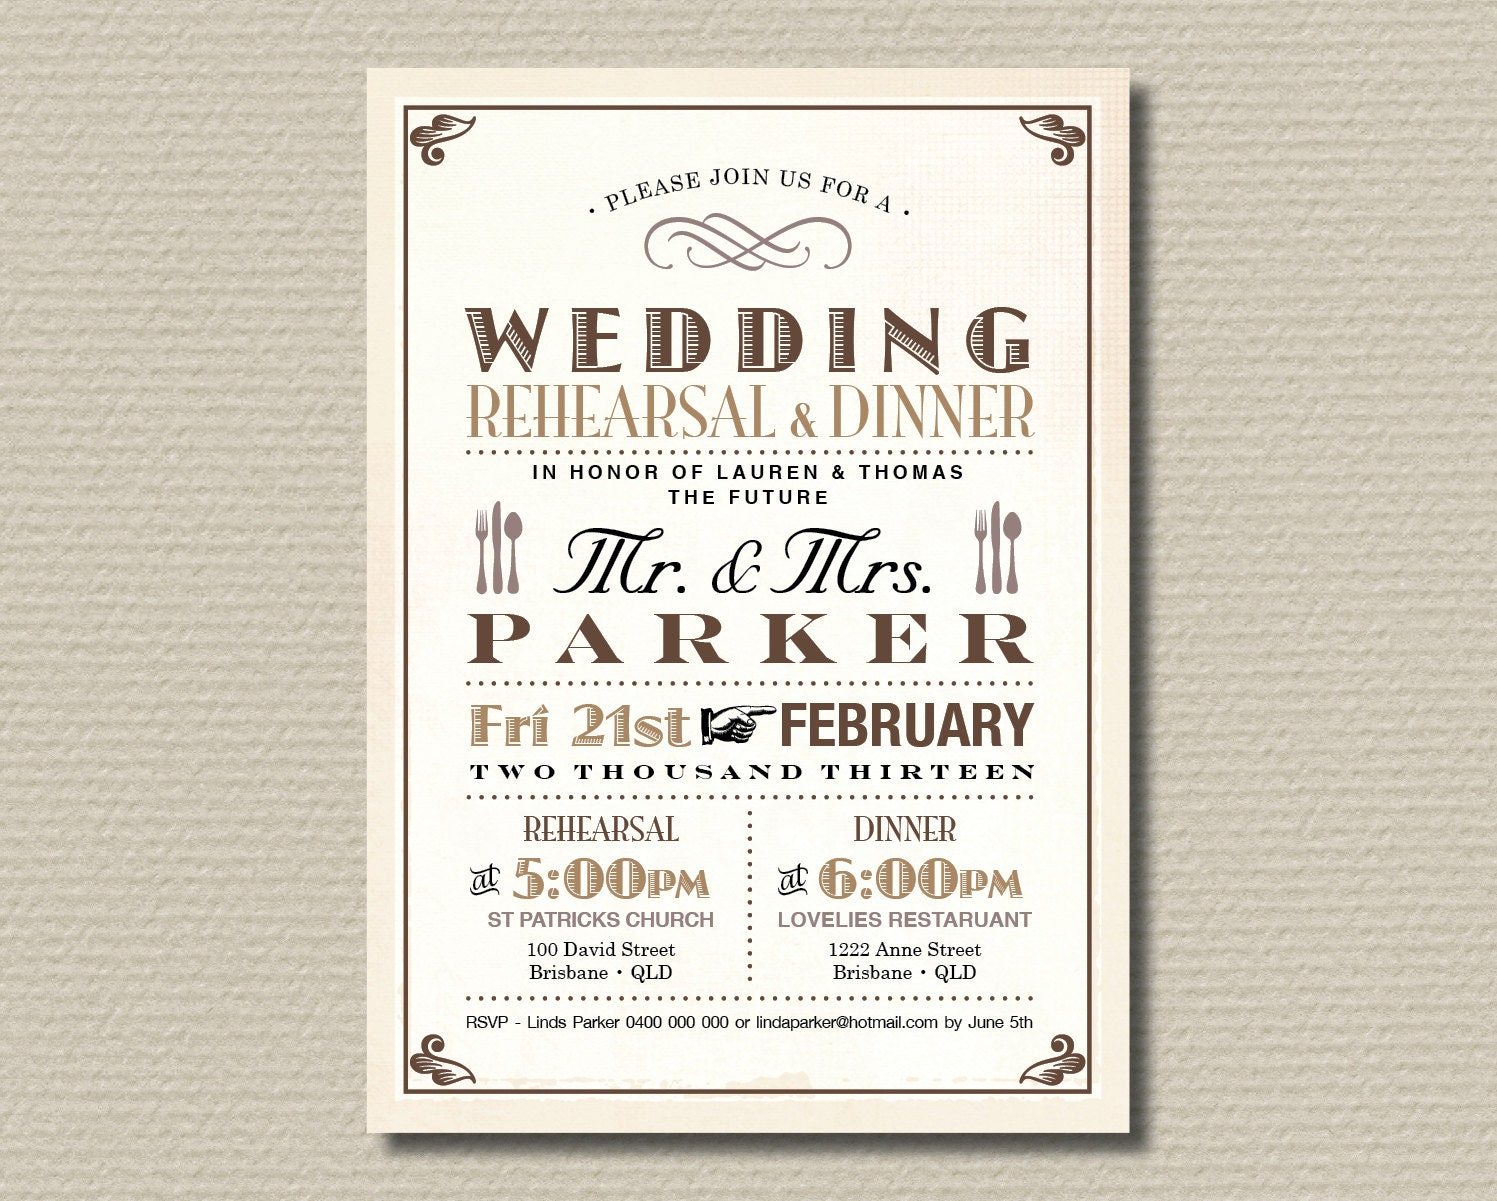 wedding rehearsal dinner invitations templates